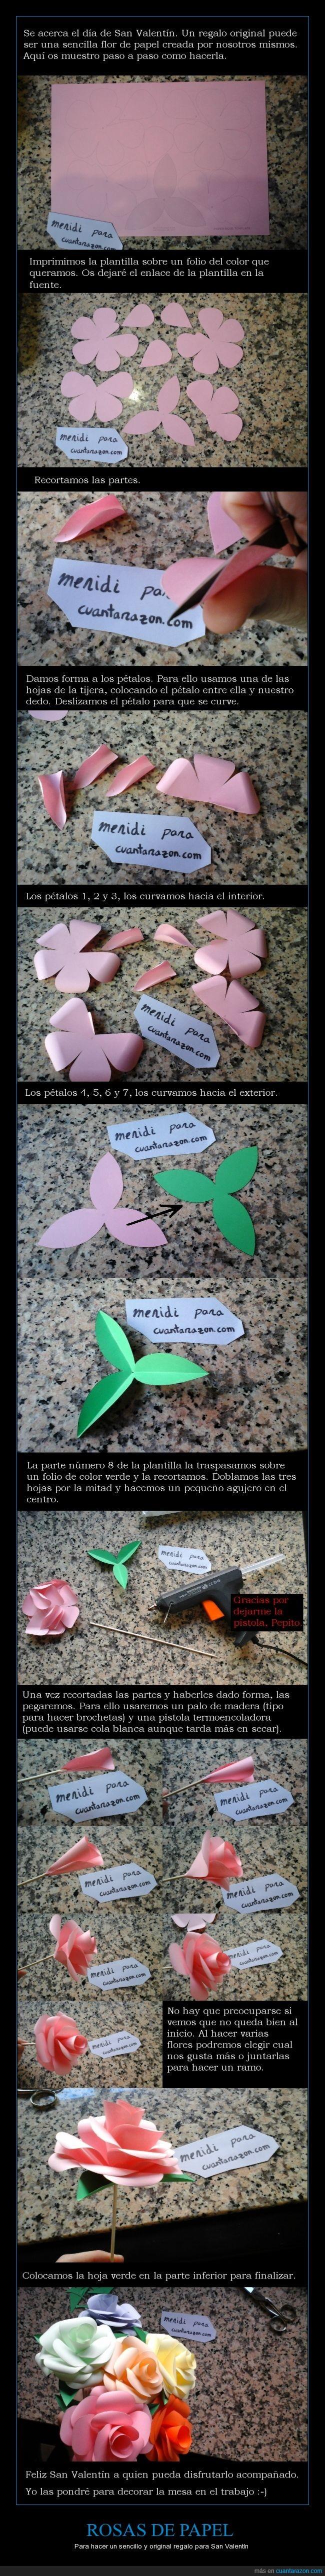 flor,manualidades,papel,pegamento,pétalo,pistola,plantilla,ramo,recortar,rosa,San Valentín,termoencoladora,tijeras